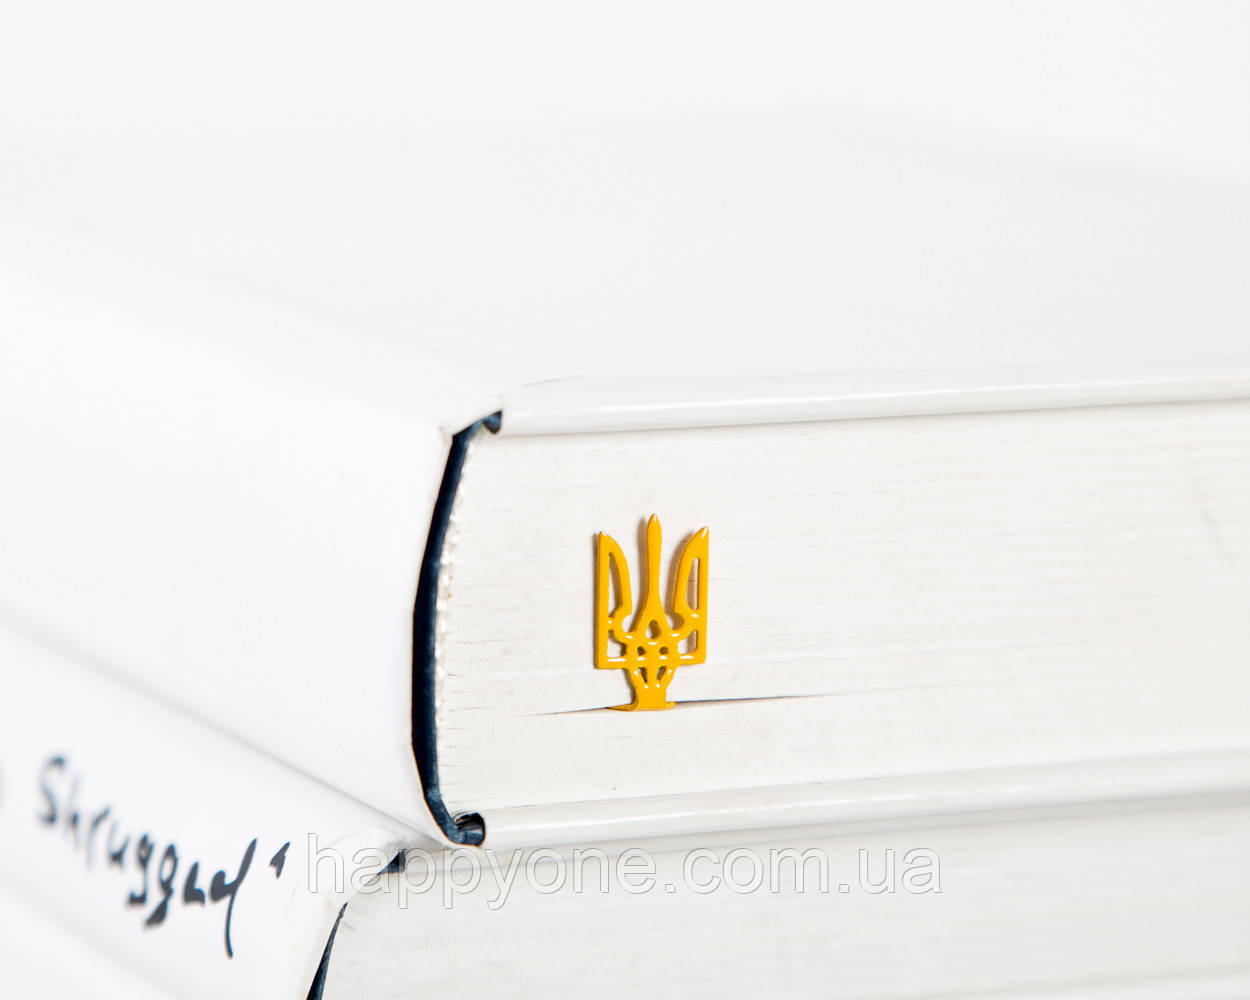 Закладка для книг Трезубец